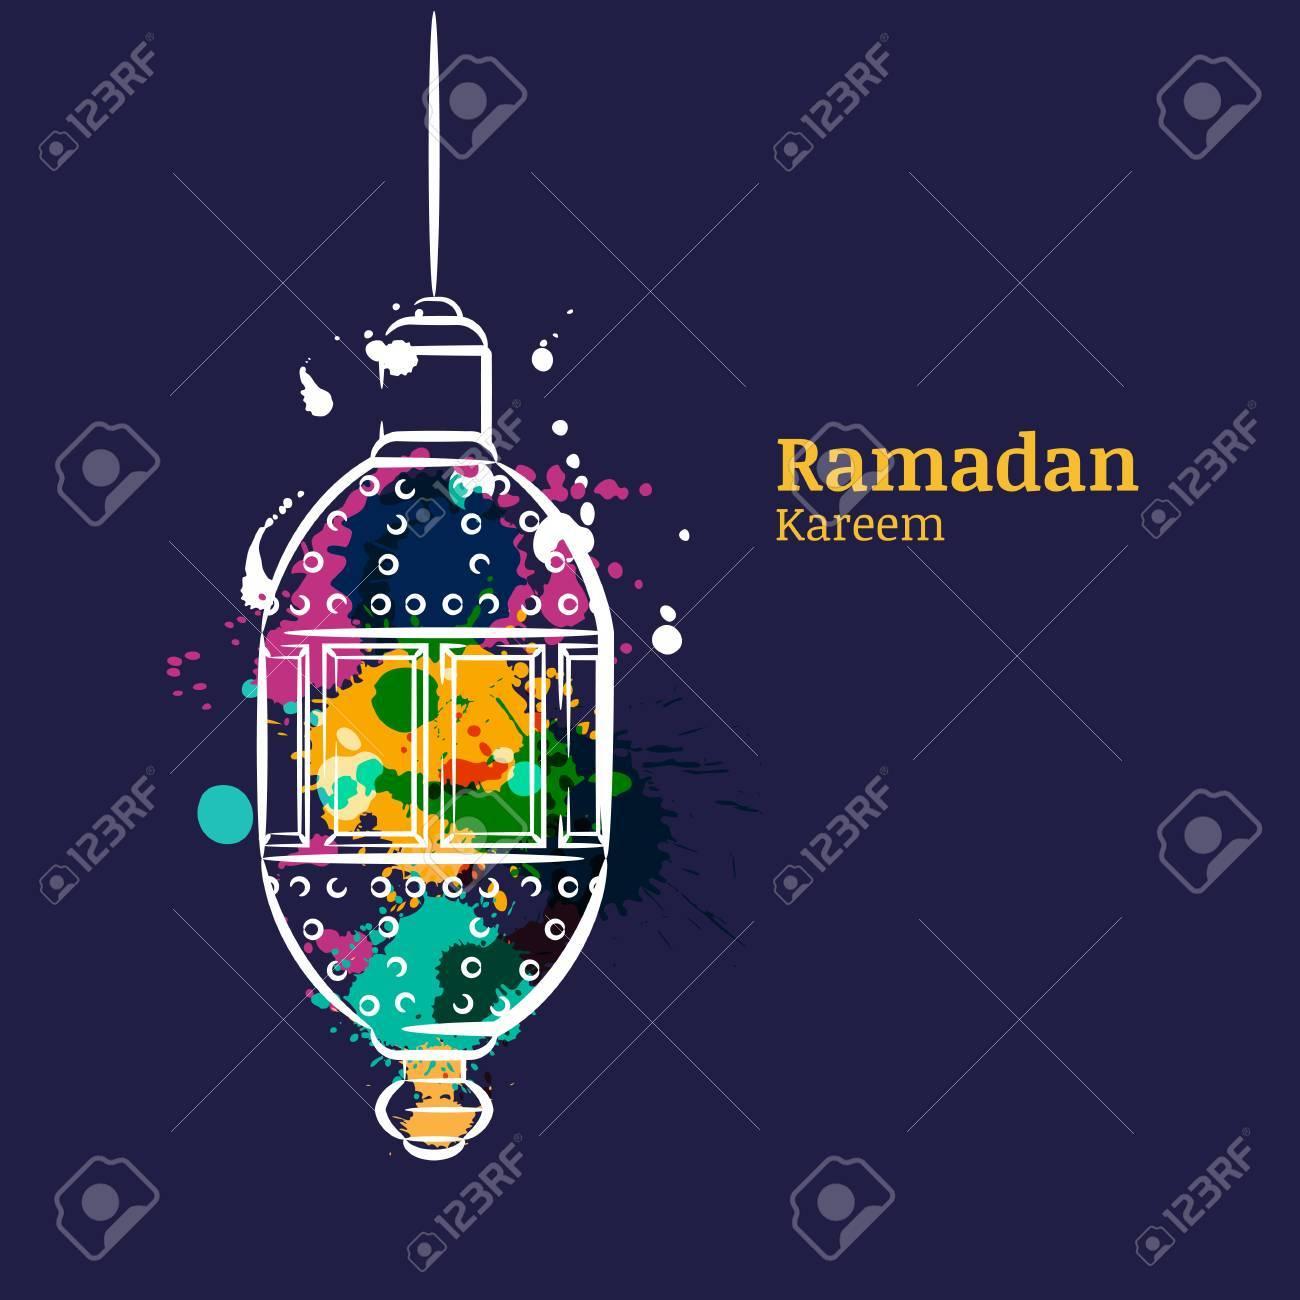 Ramadan greeting card with traditional watercolor night lantern ramadan greeting card with traditional watercolor night lantern ramadan kareem watercolor dark blue background m4hsunfo